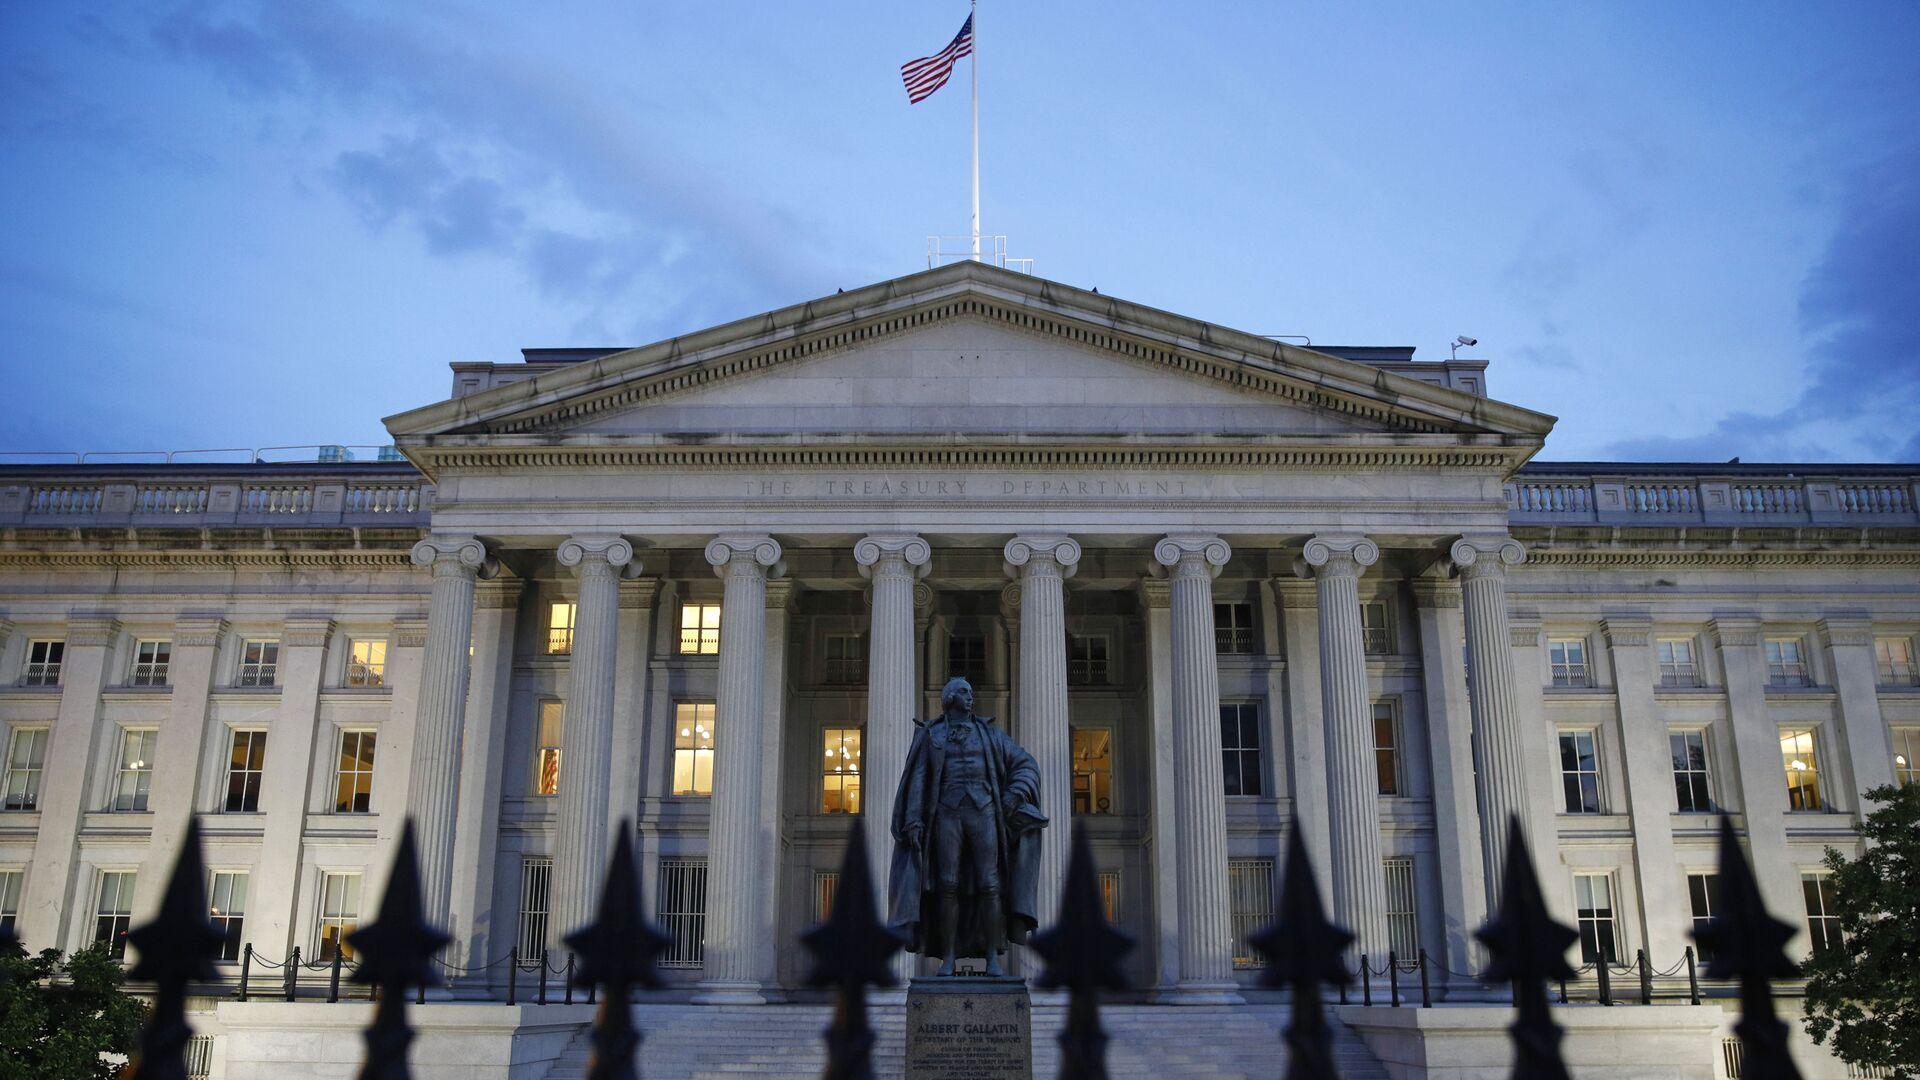 The U.S. Treasury Department building at dusk, Thursday, June 6, 2019, in Washington. - Sputnik International, 1920, 16.09.2021